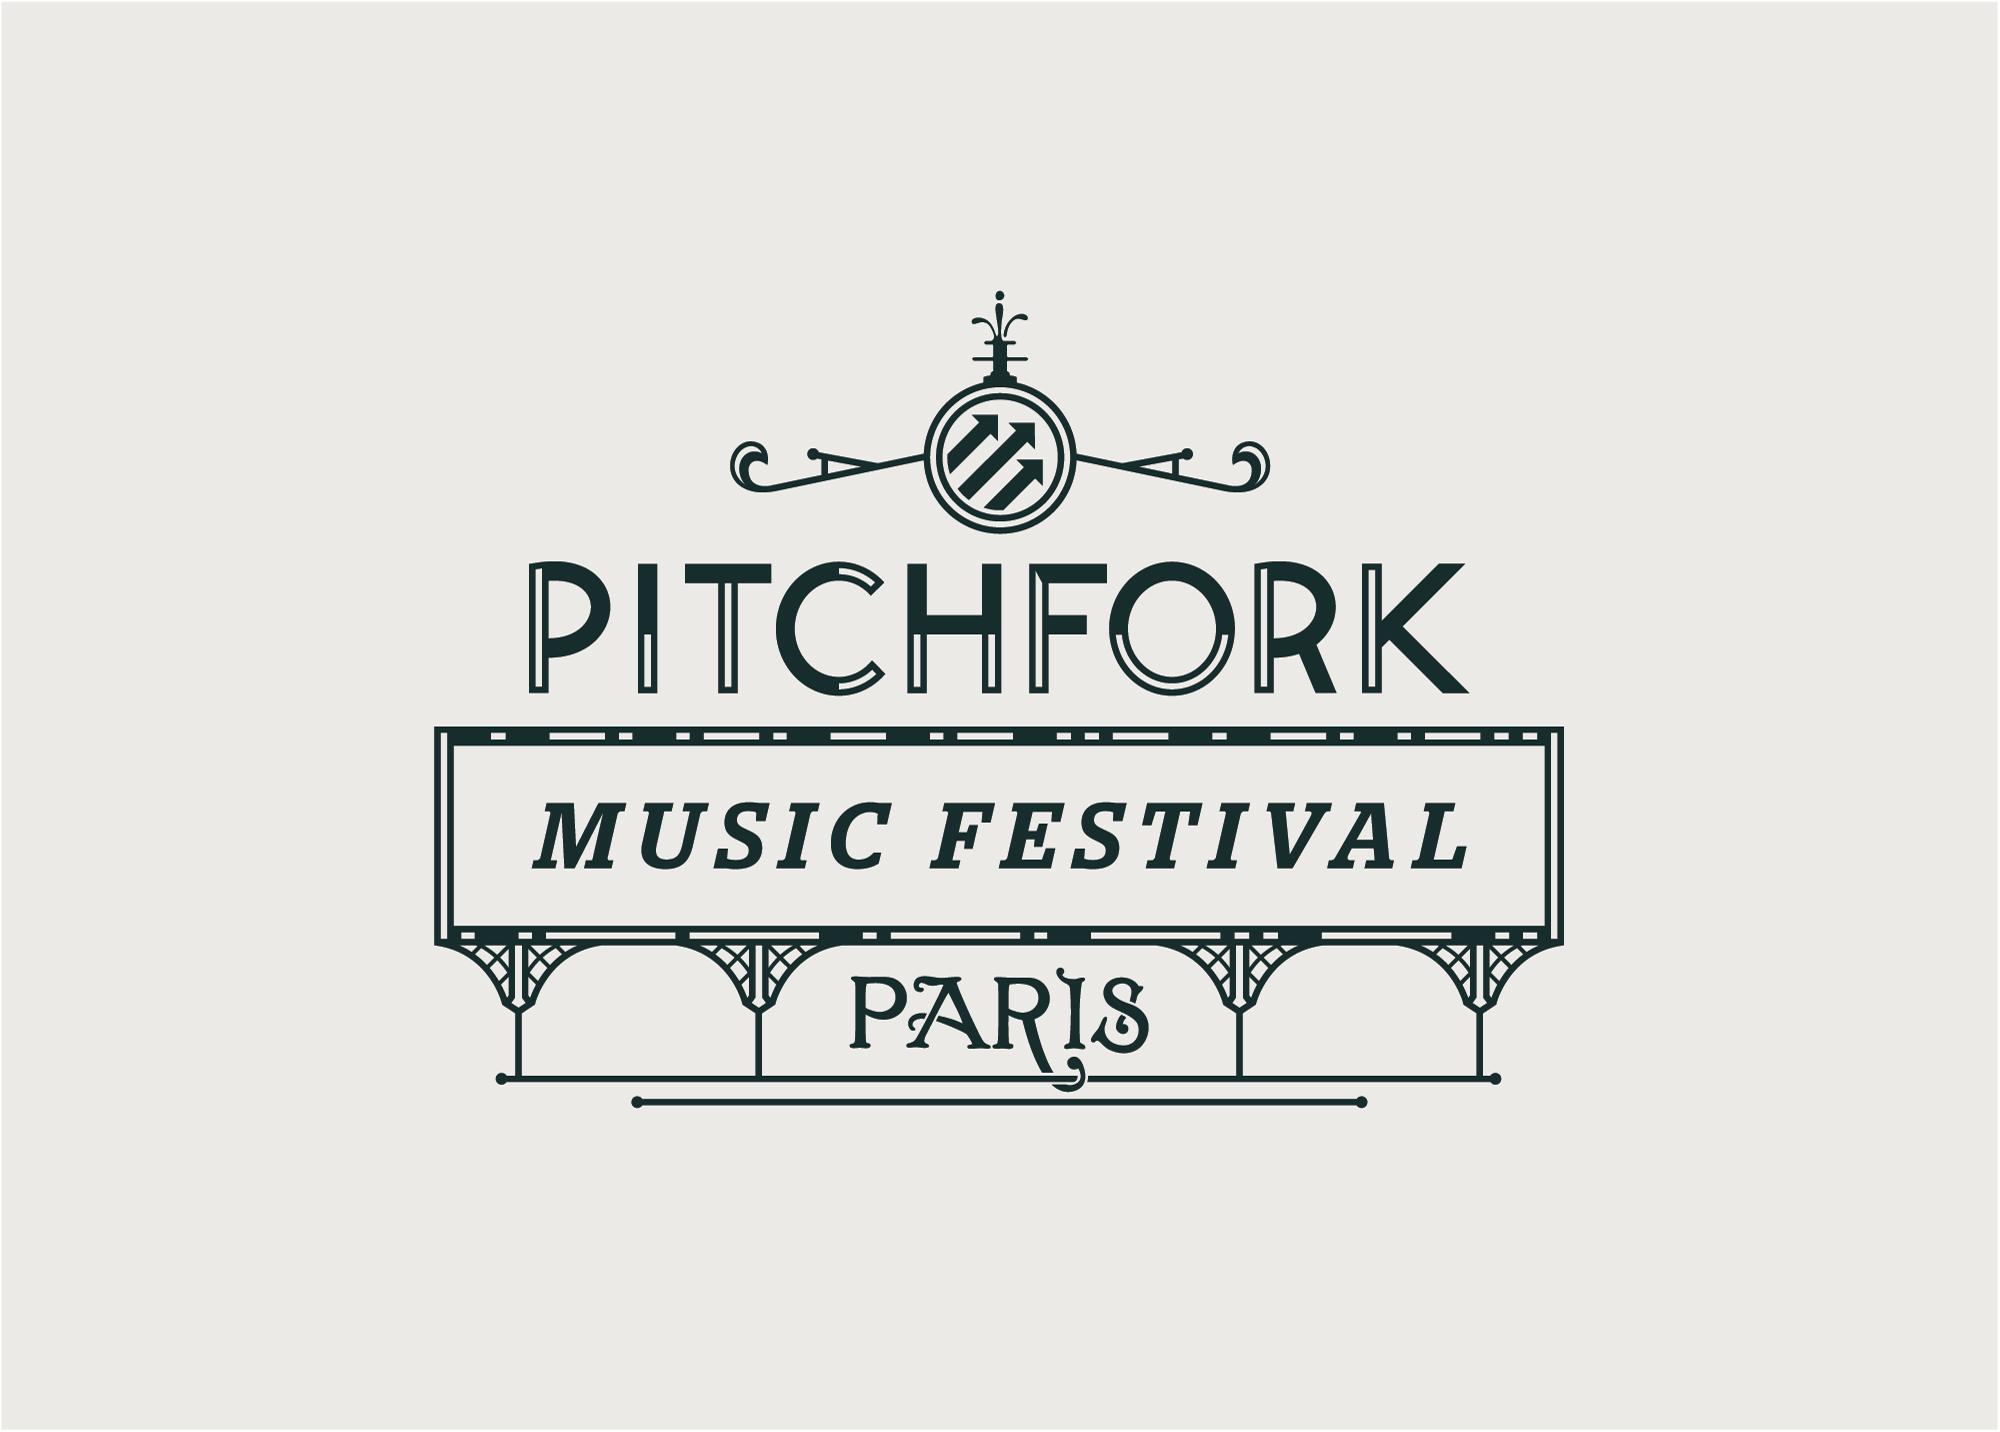 #Pitchfork Music Festival Paris 2014 : Essential Guide